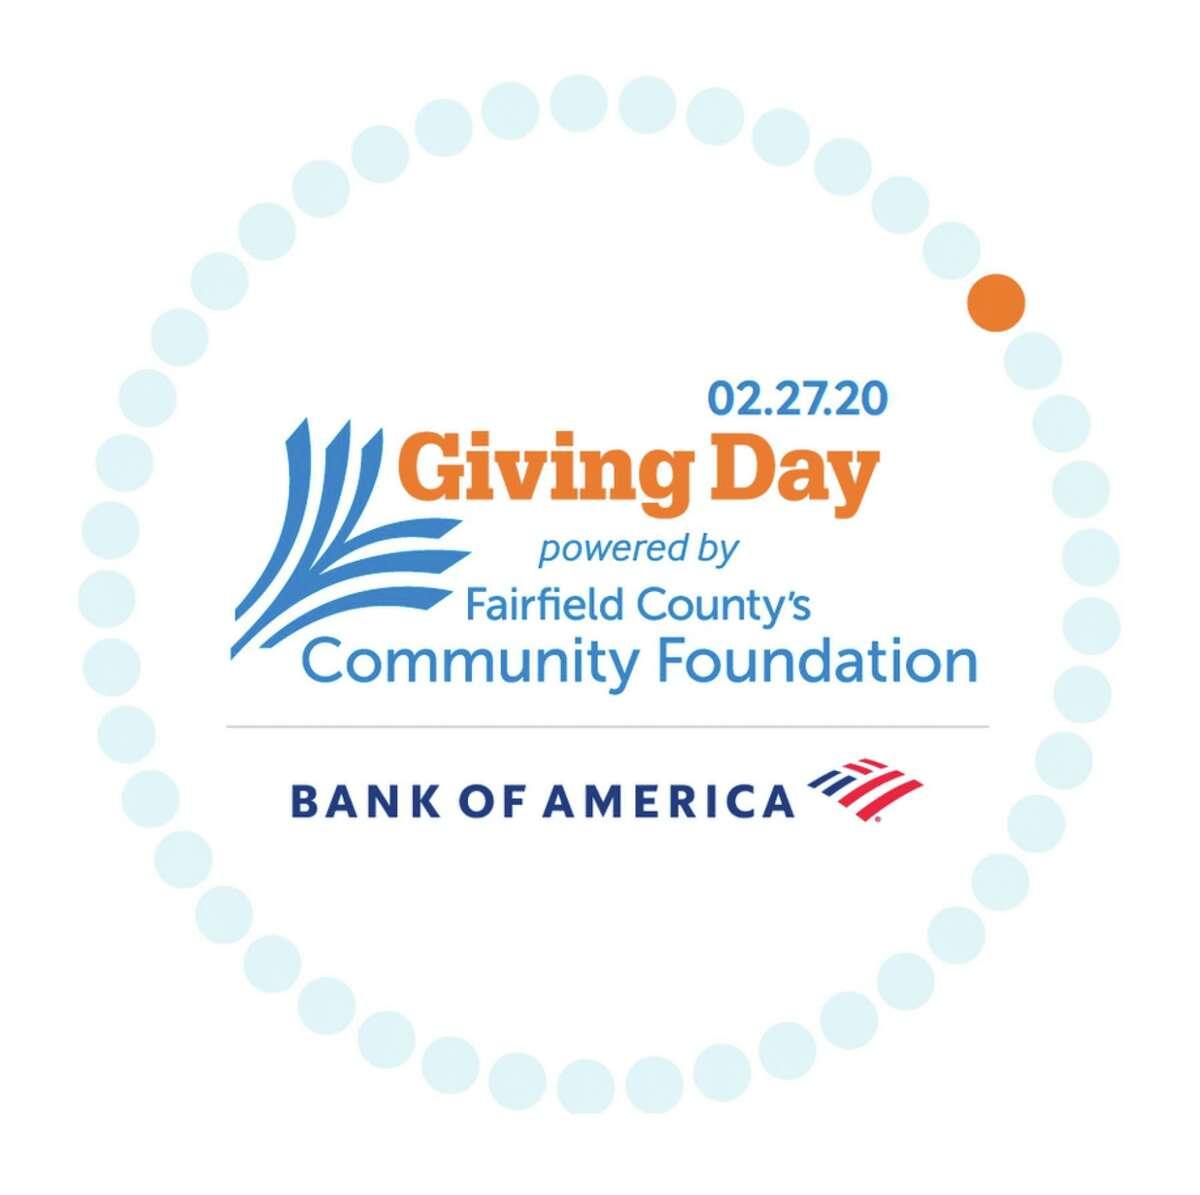 Fairfield County Giving Day 2020 logo